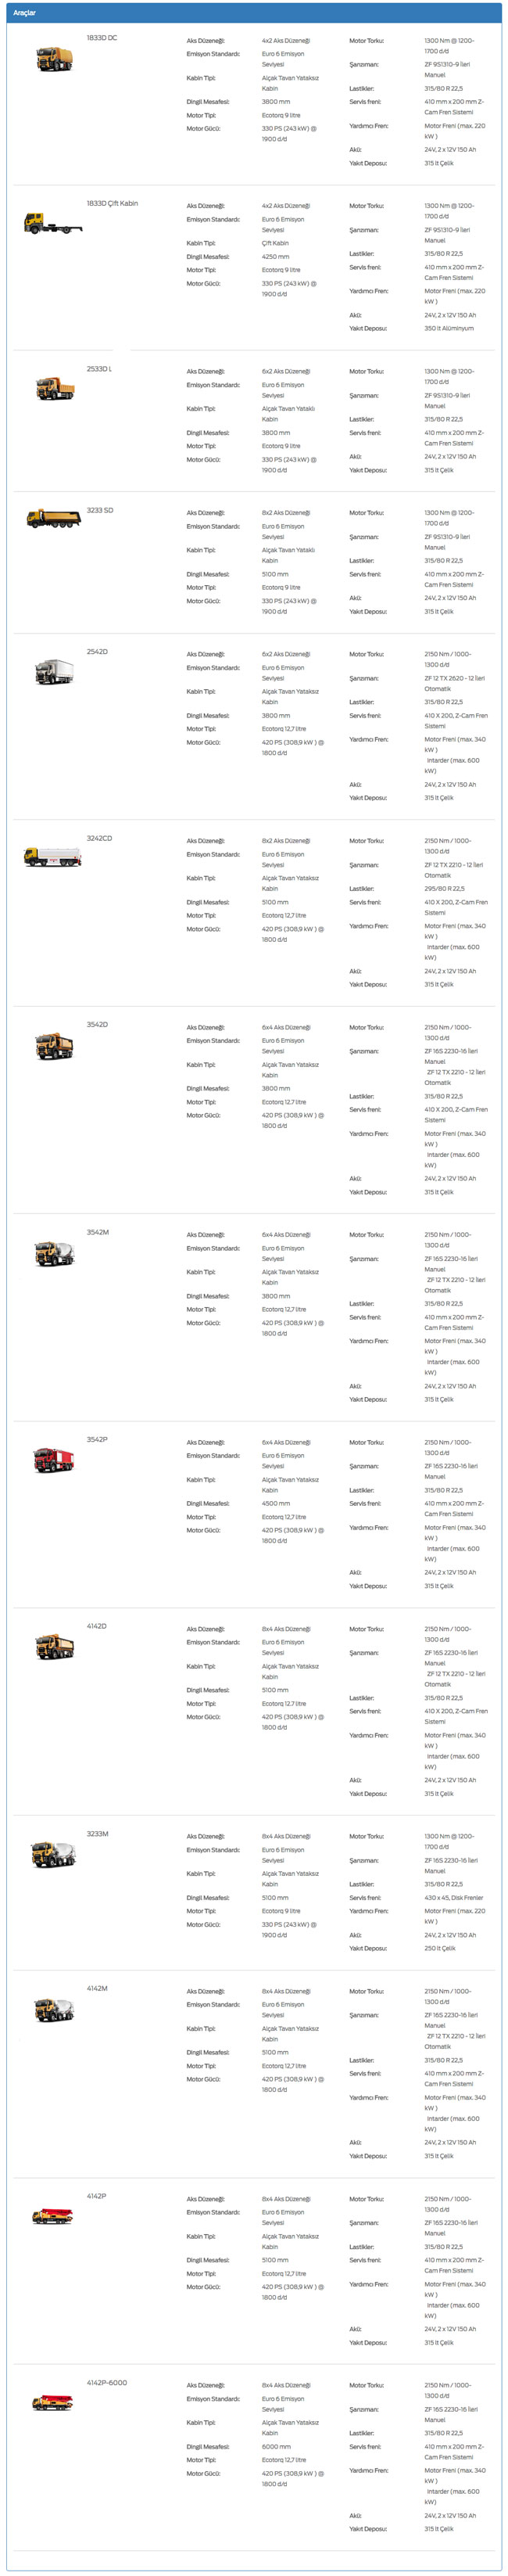 Ford Trucks Yeni İnşaat Serisi